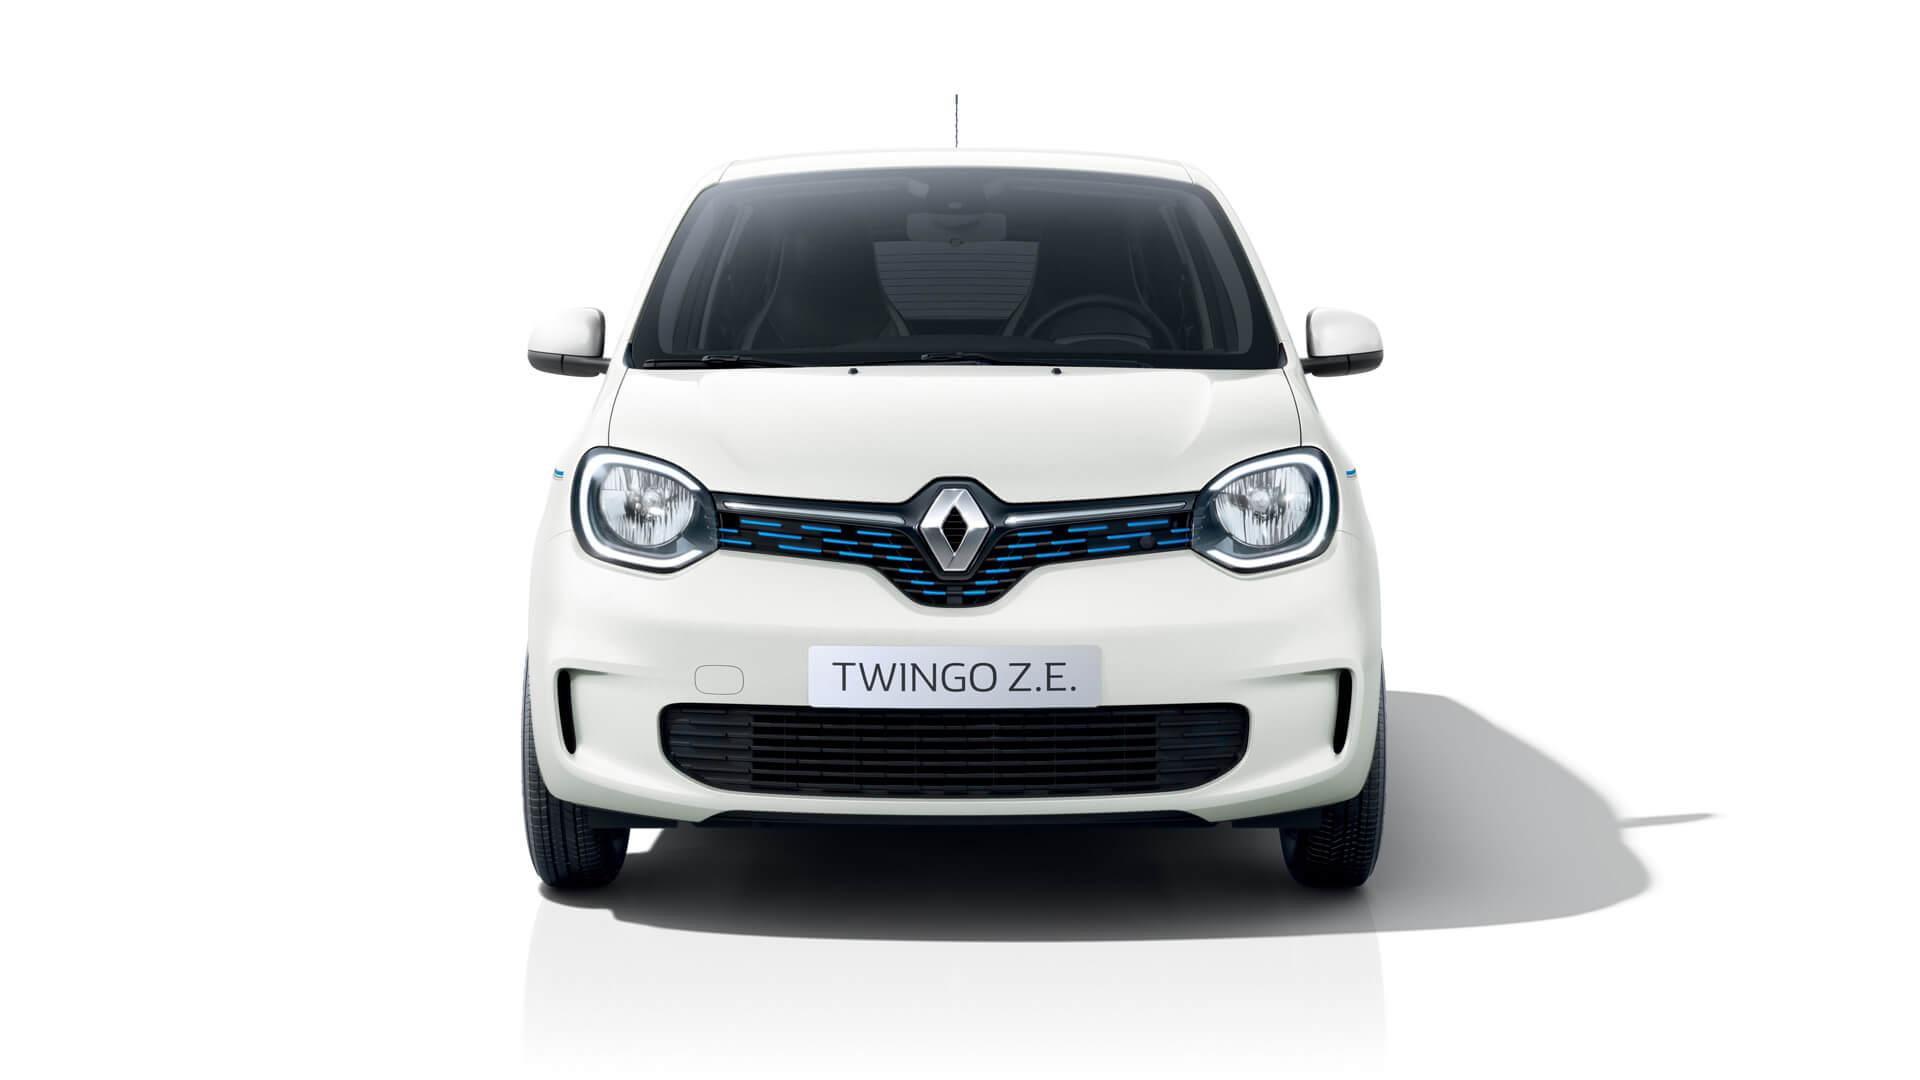 Электромобиль Renault Twingo Z.E. - вид спереди